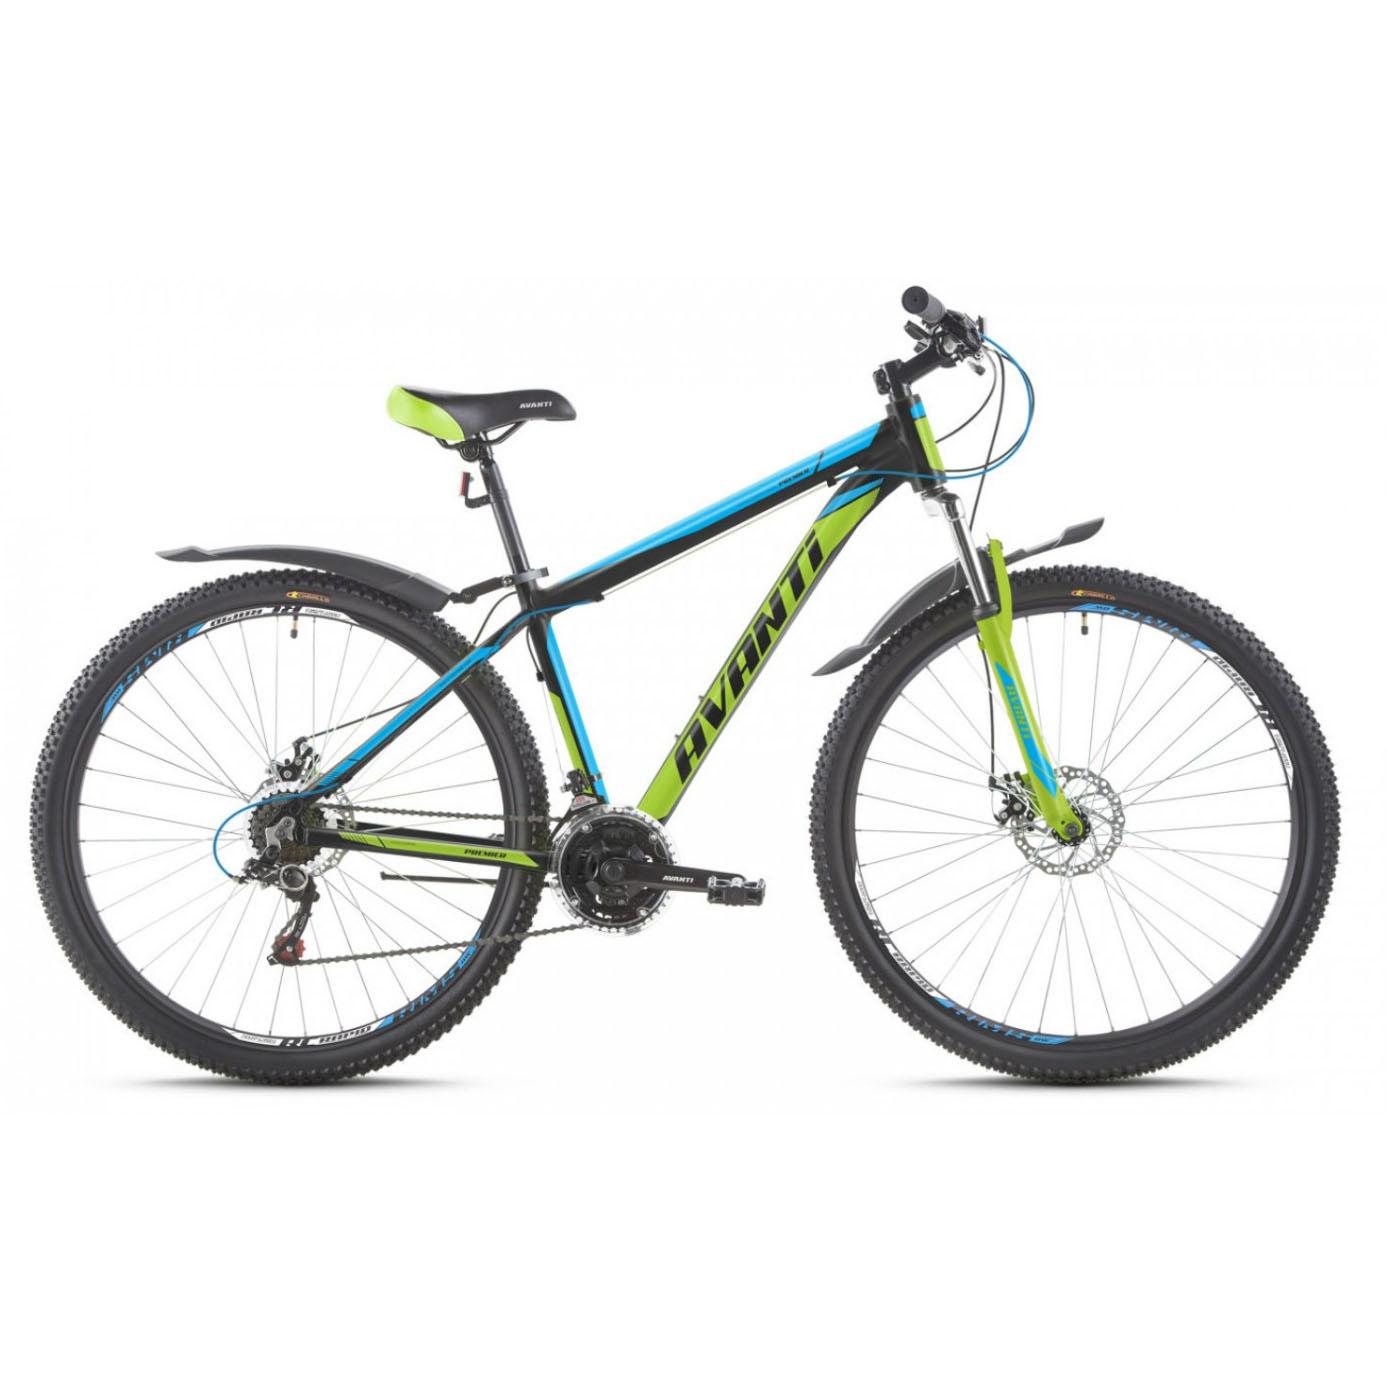 Фото Горный Велосипед   27,5 Avanti Premier disk 2017 черно-зелено-синий